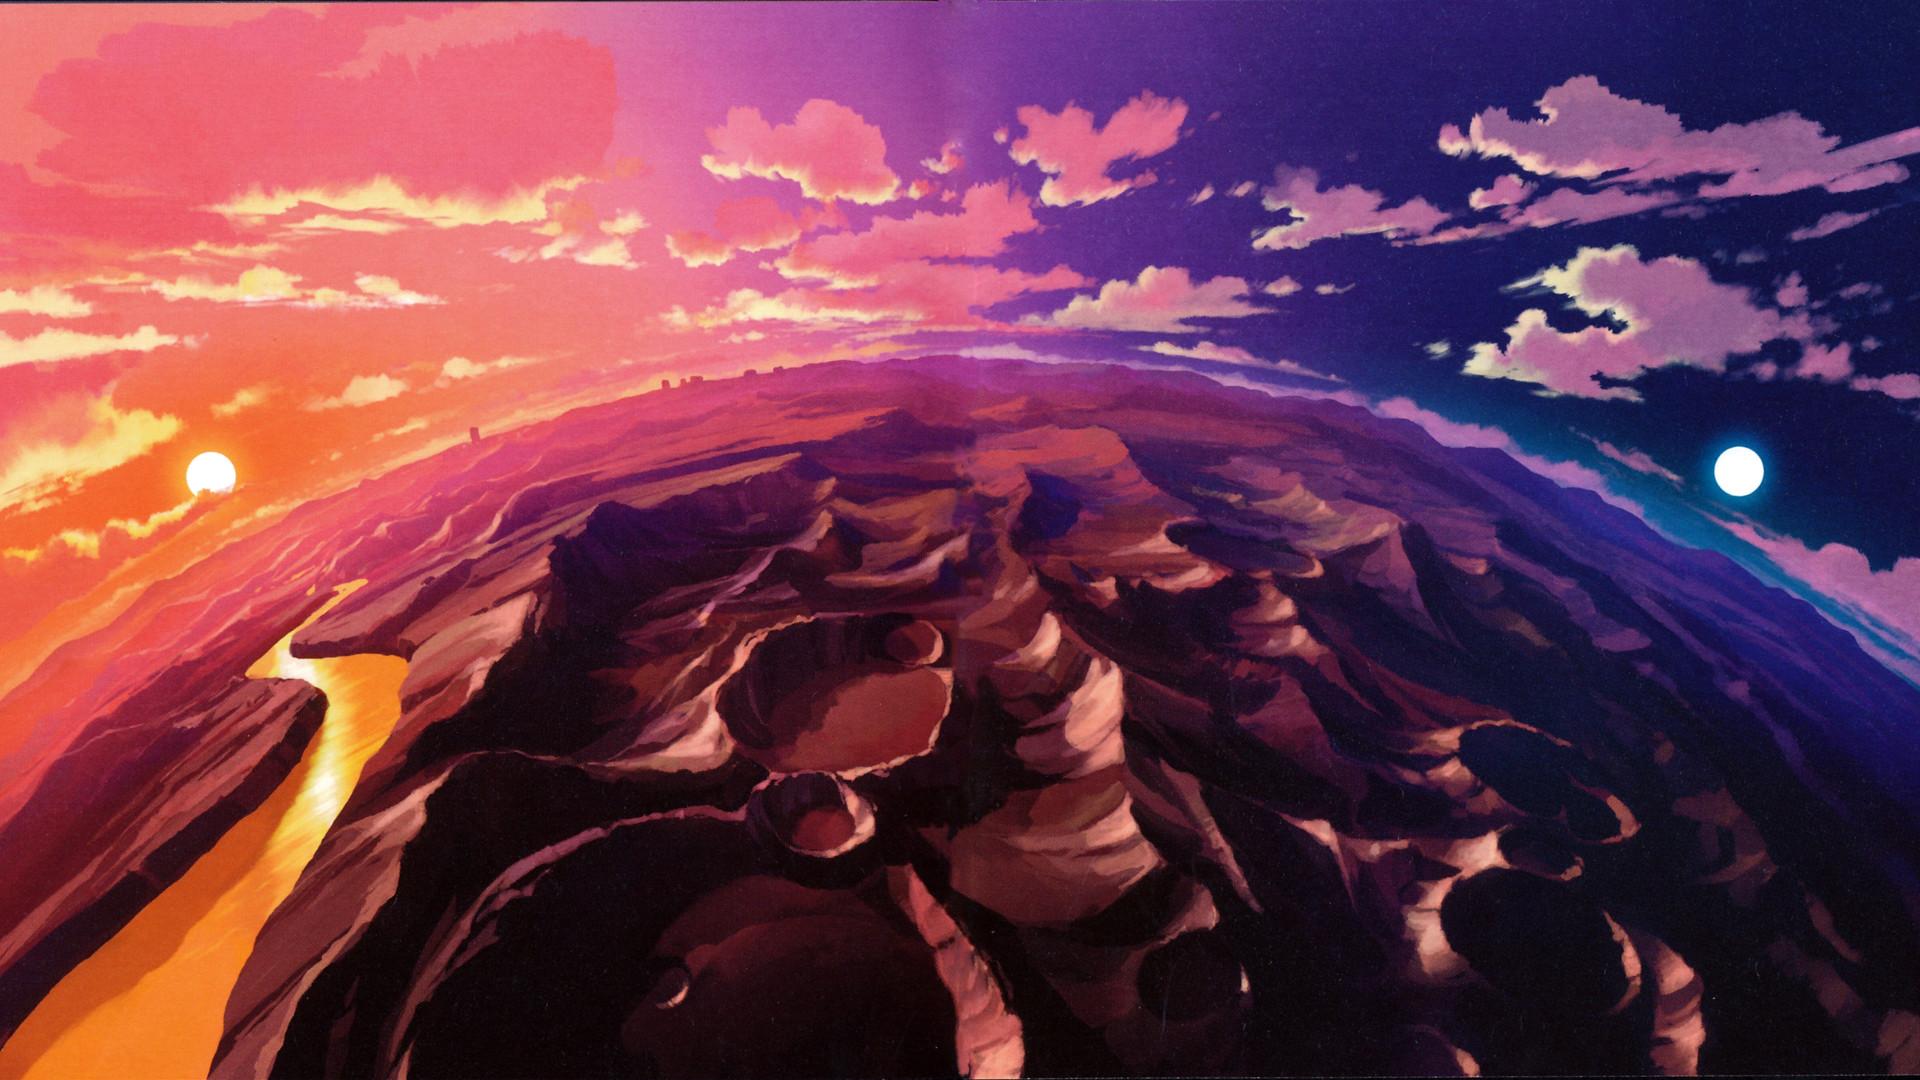 Planet Tengen Toppa anime Gurren Lagann wallpapers and images .